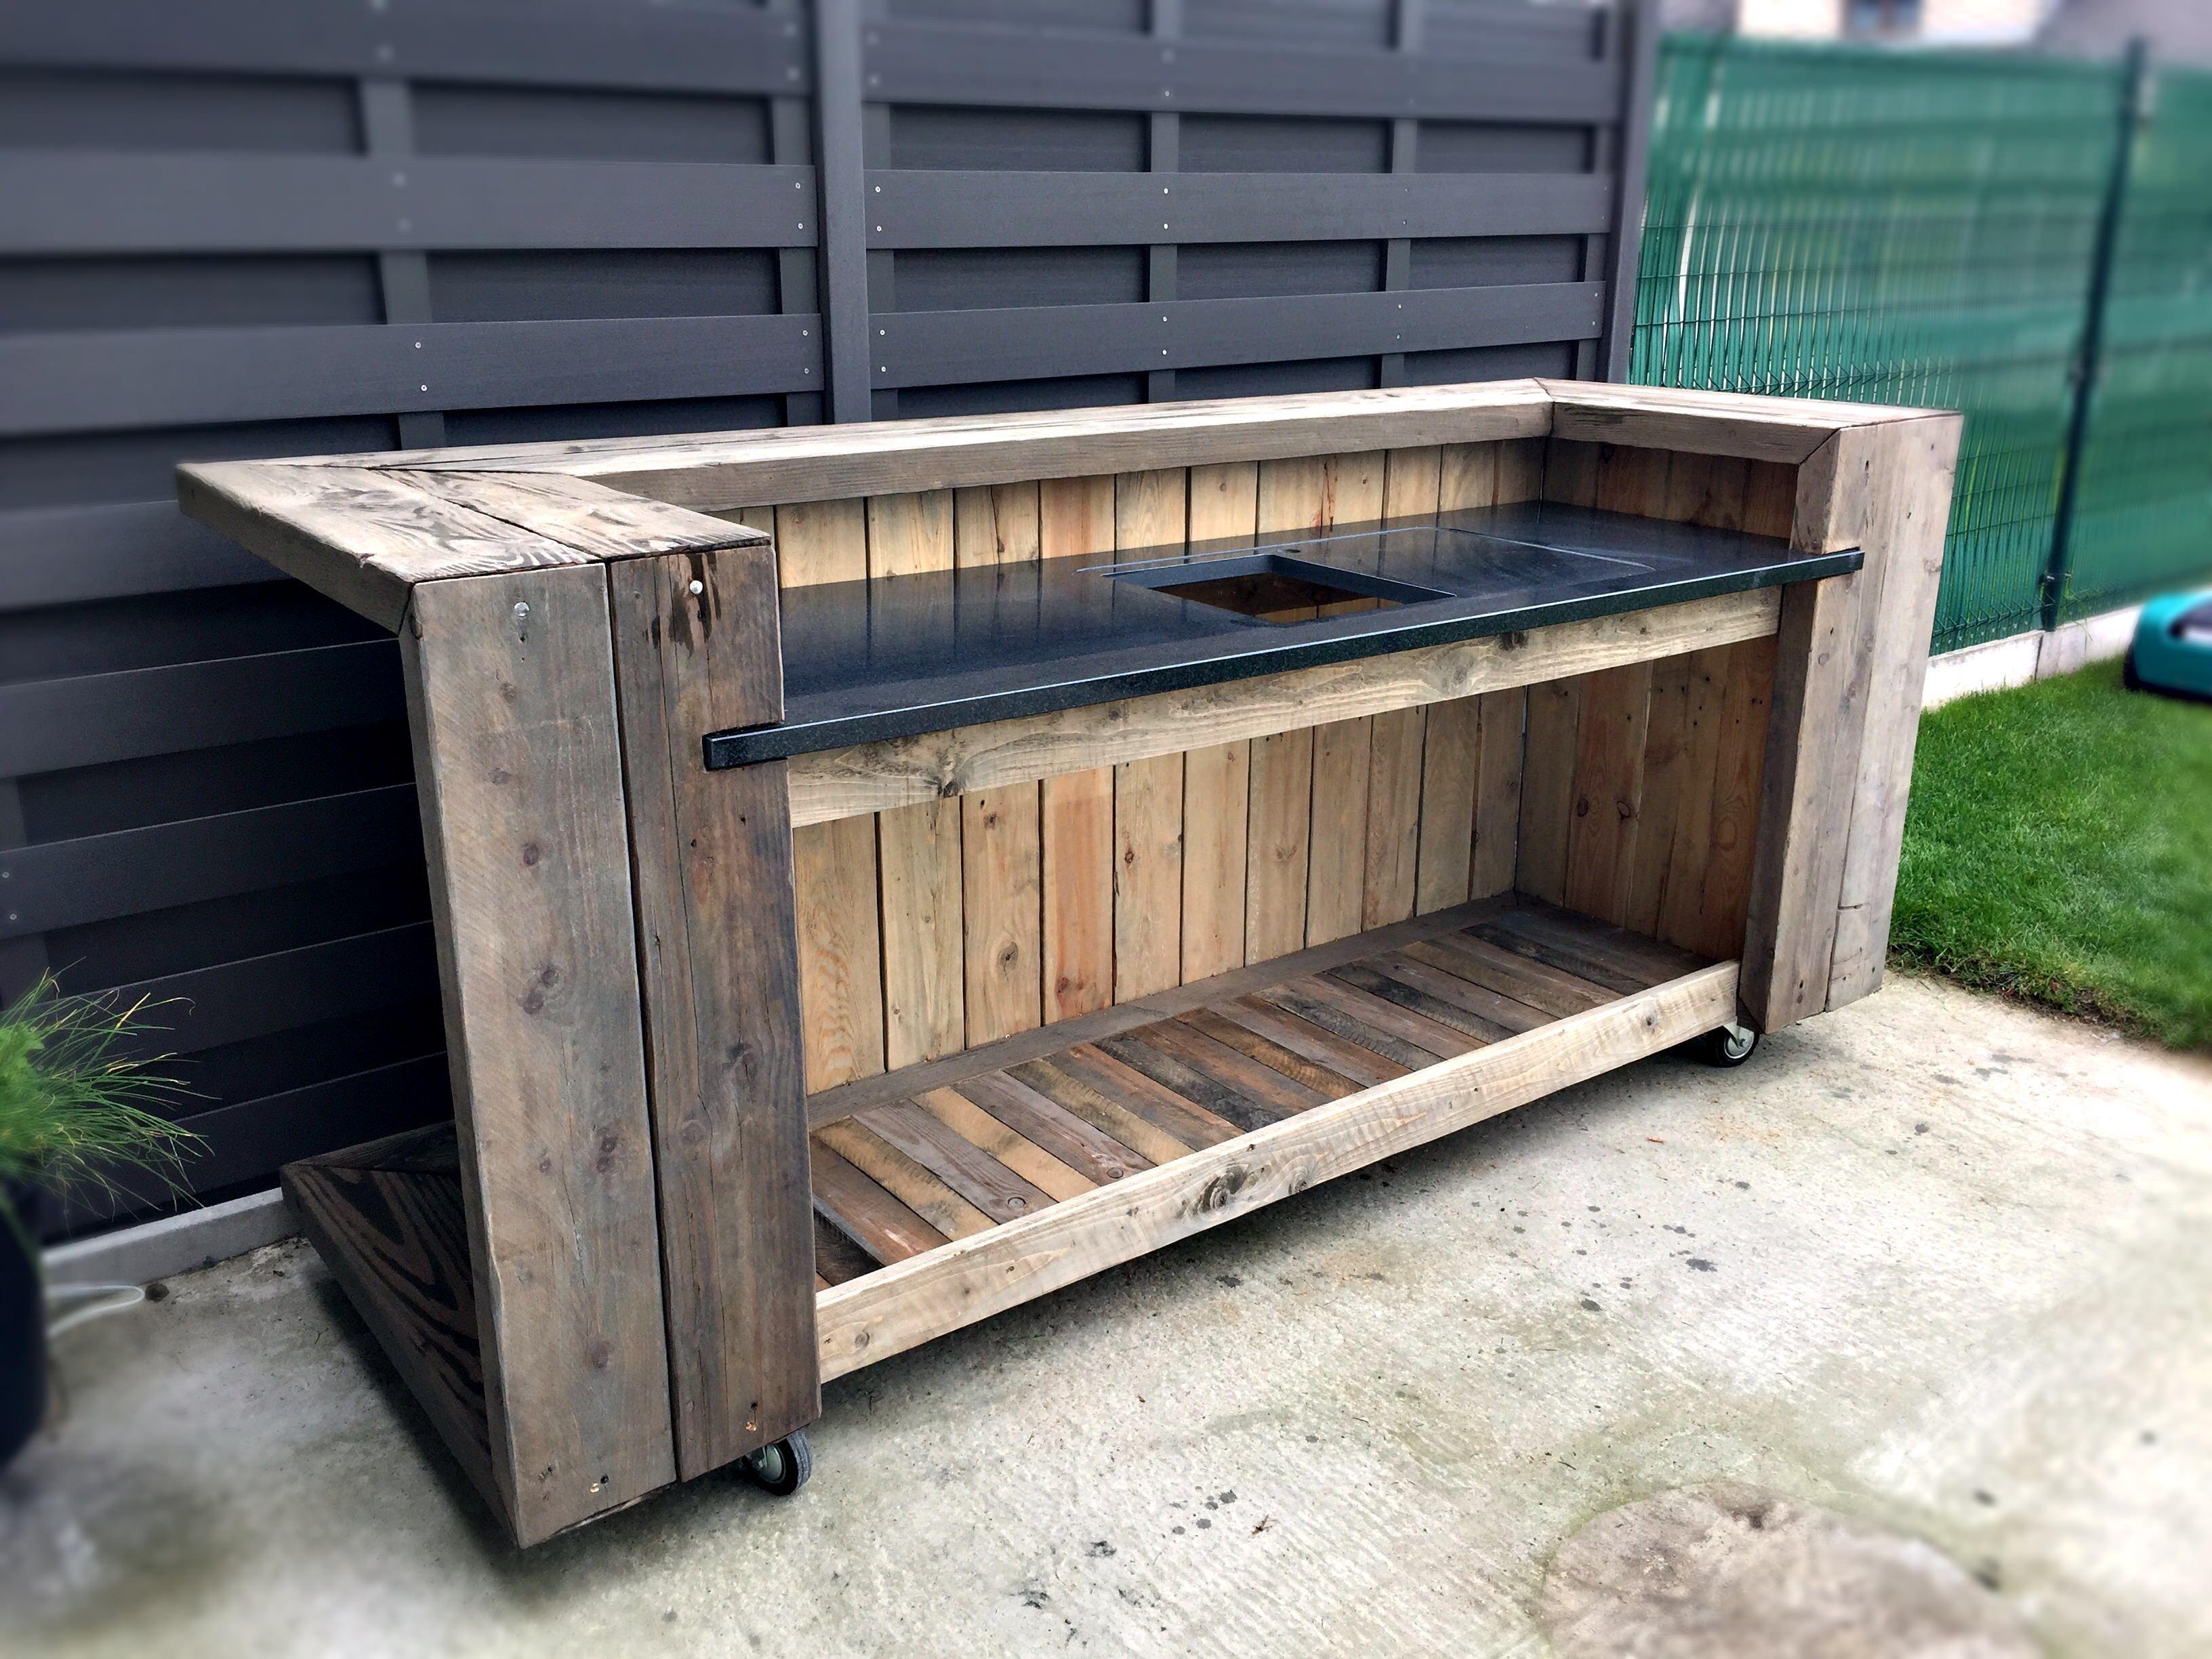 Outdoor Küche Europaletten : Pallet outdoor kitchen bar outside outdoor küche